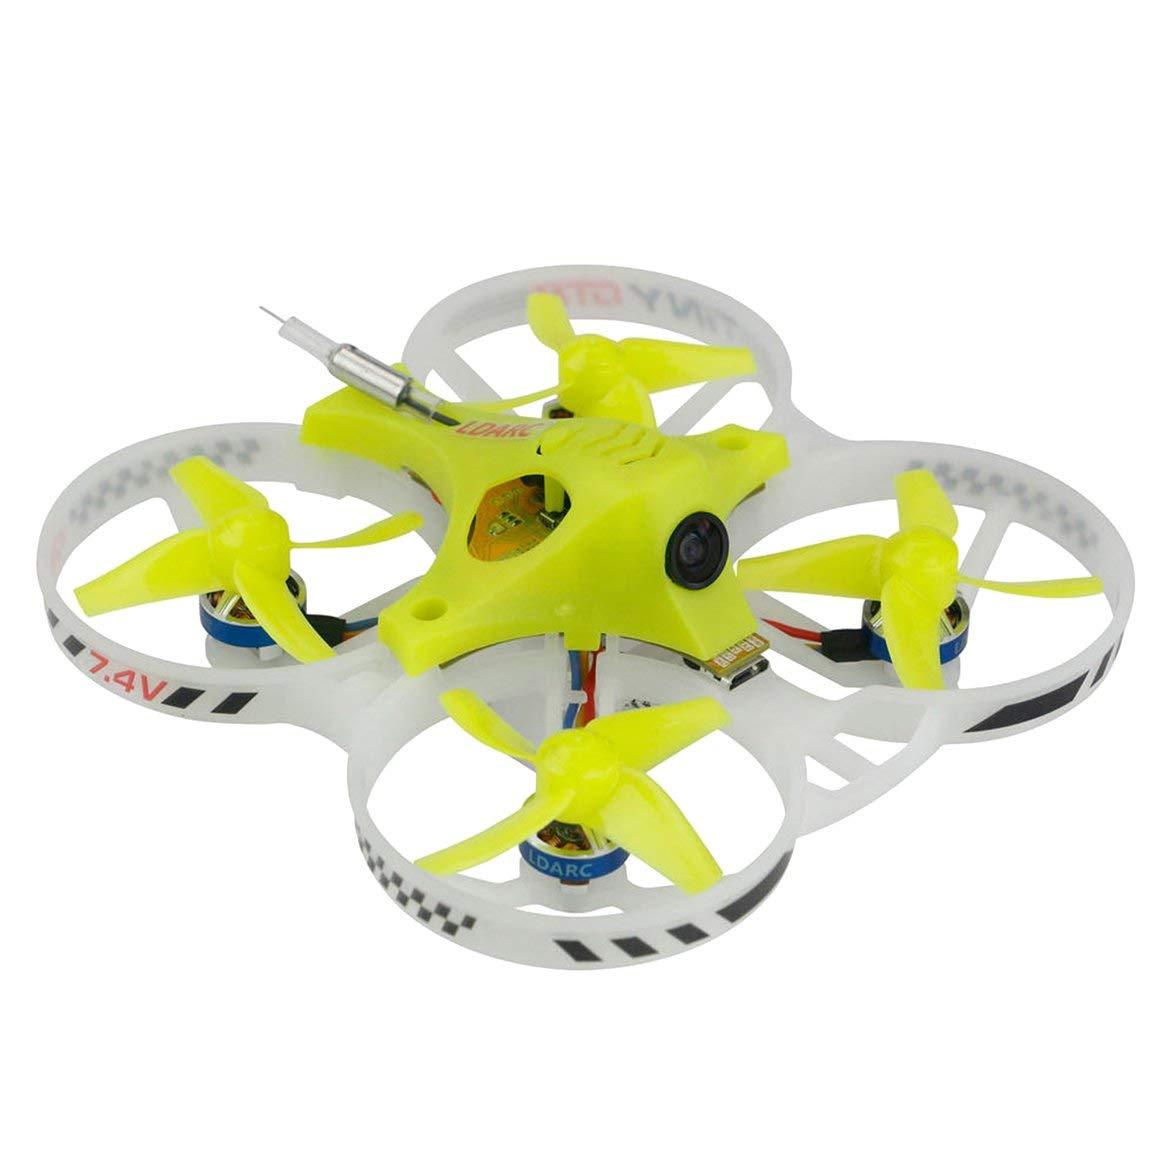 Intercorey GT8 2019 V2 2S LDARC TINY FPV Racing Drone Betaflight F3 10A Blheli_S 800TVL Cam 5.8G 25mW VTX 2S Without receiver B07SHGF5T2